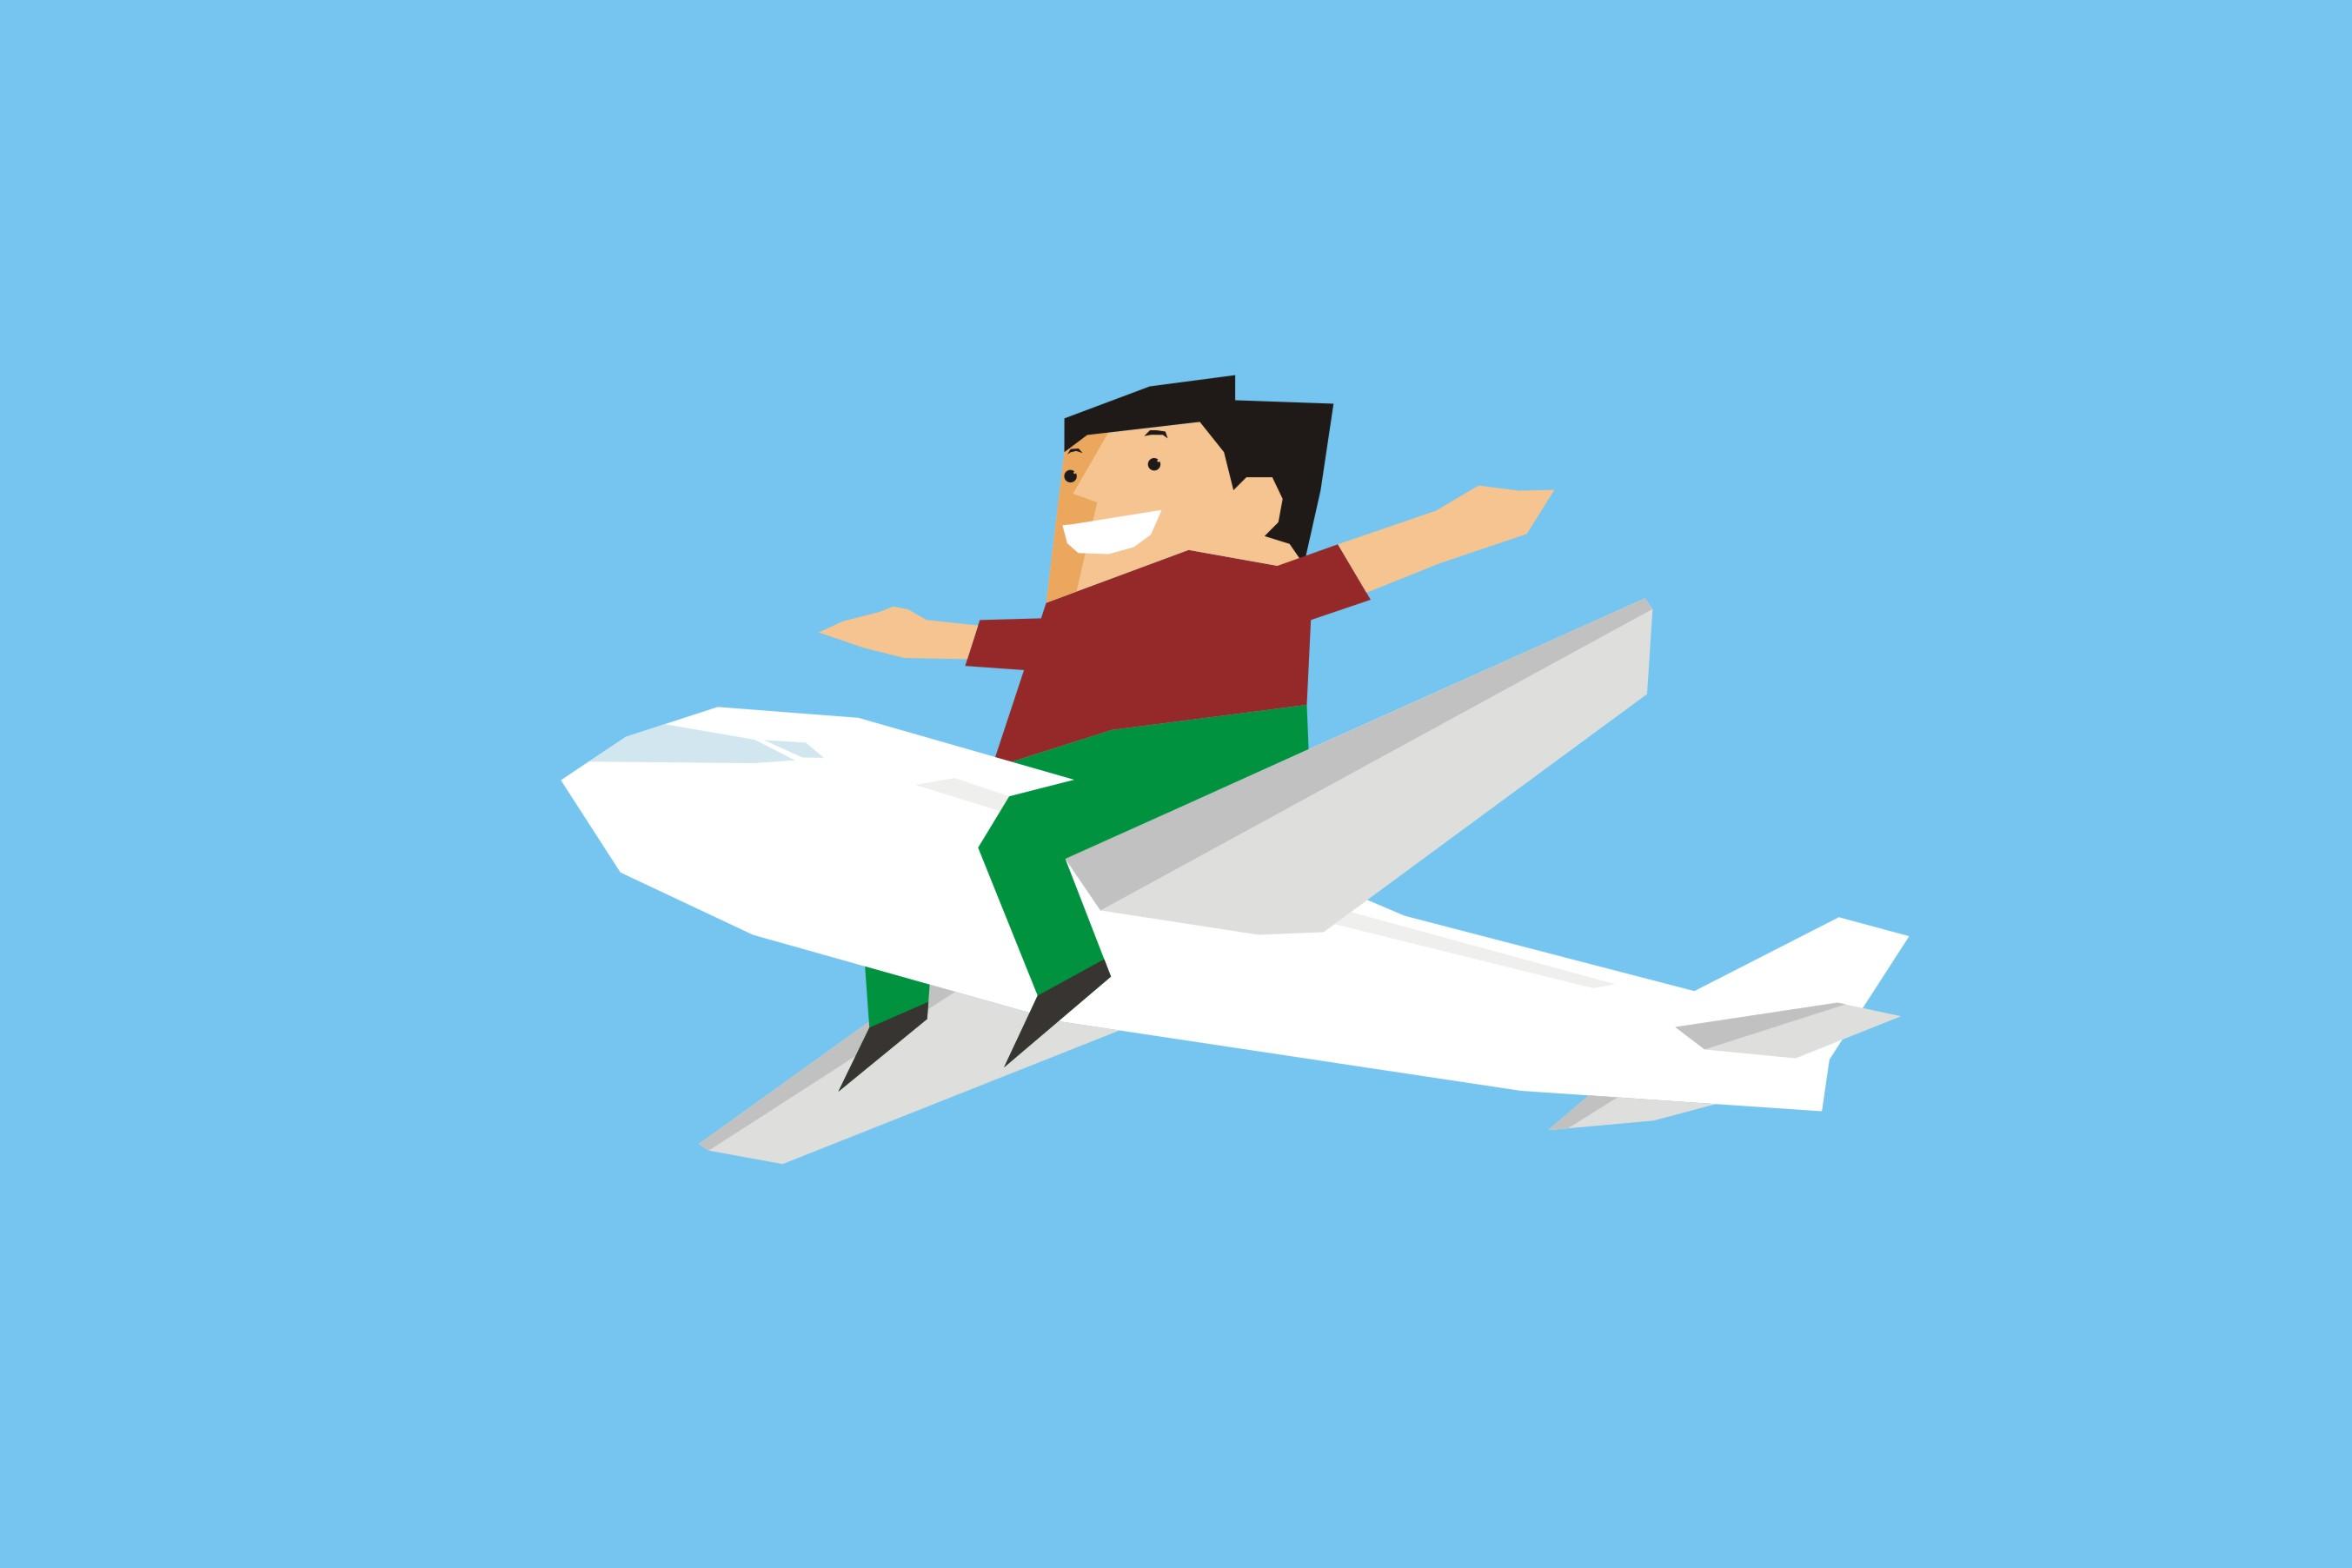 10 Etika naik pesawat yang harus kamu tahu dan wajib dilakukan